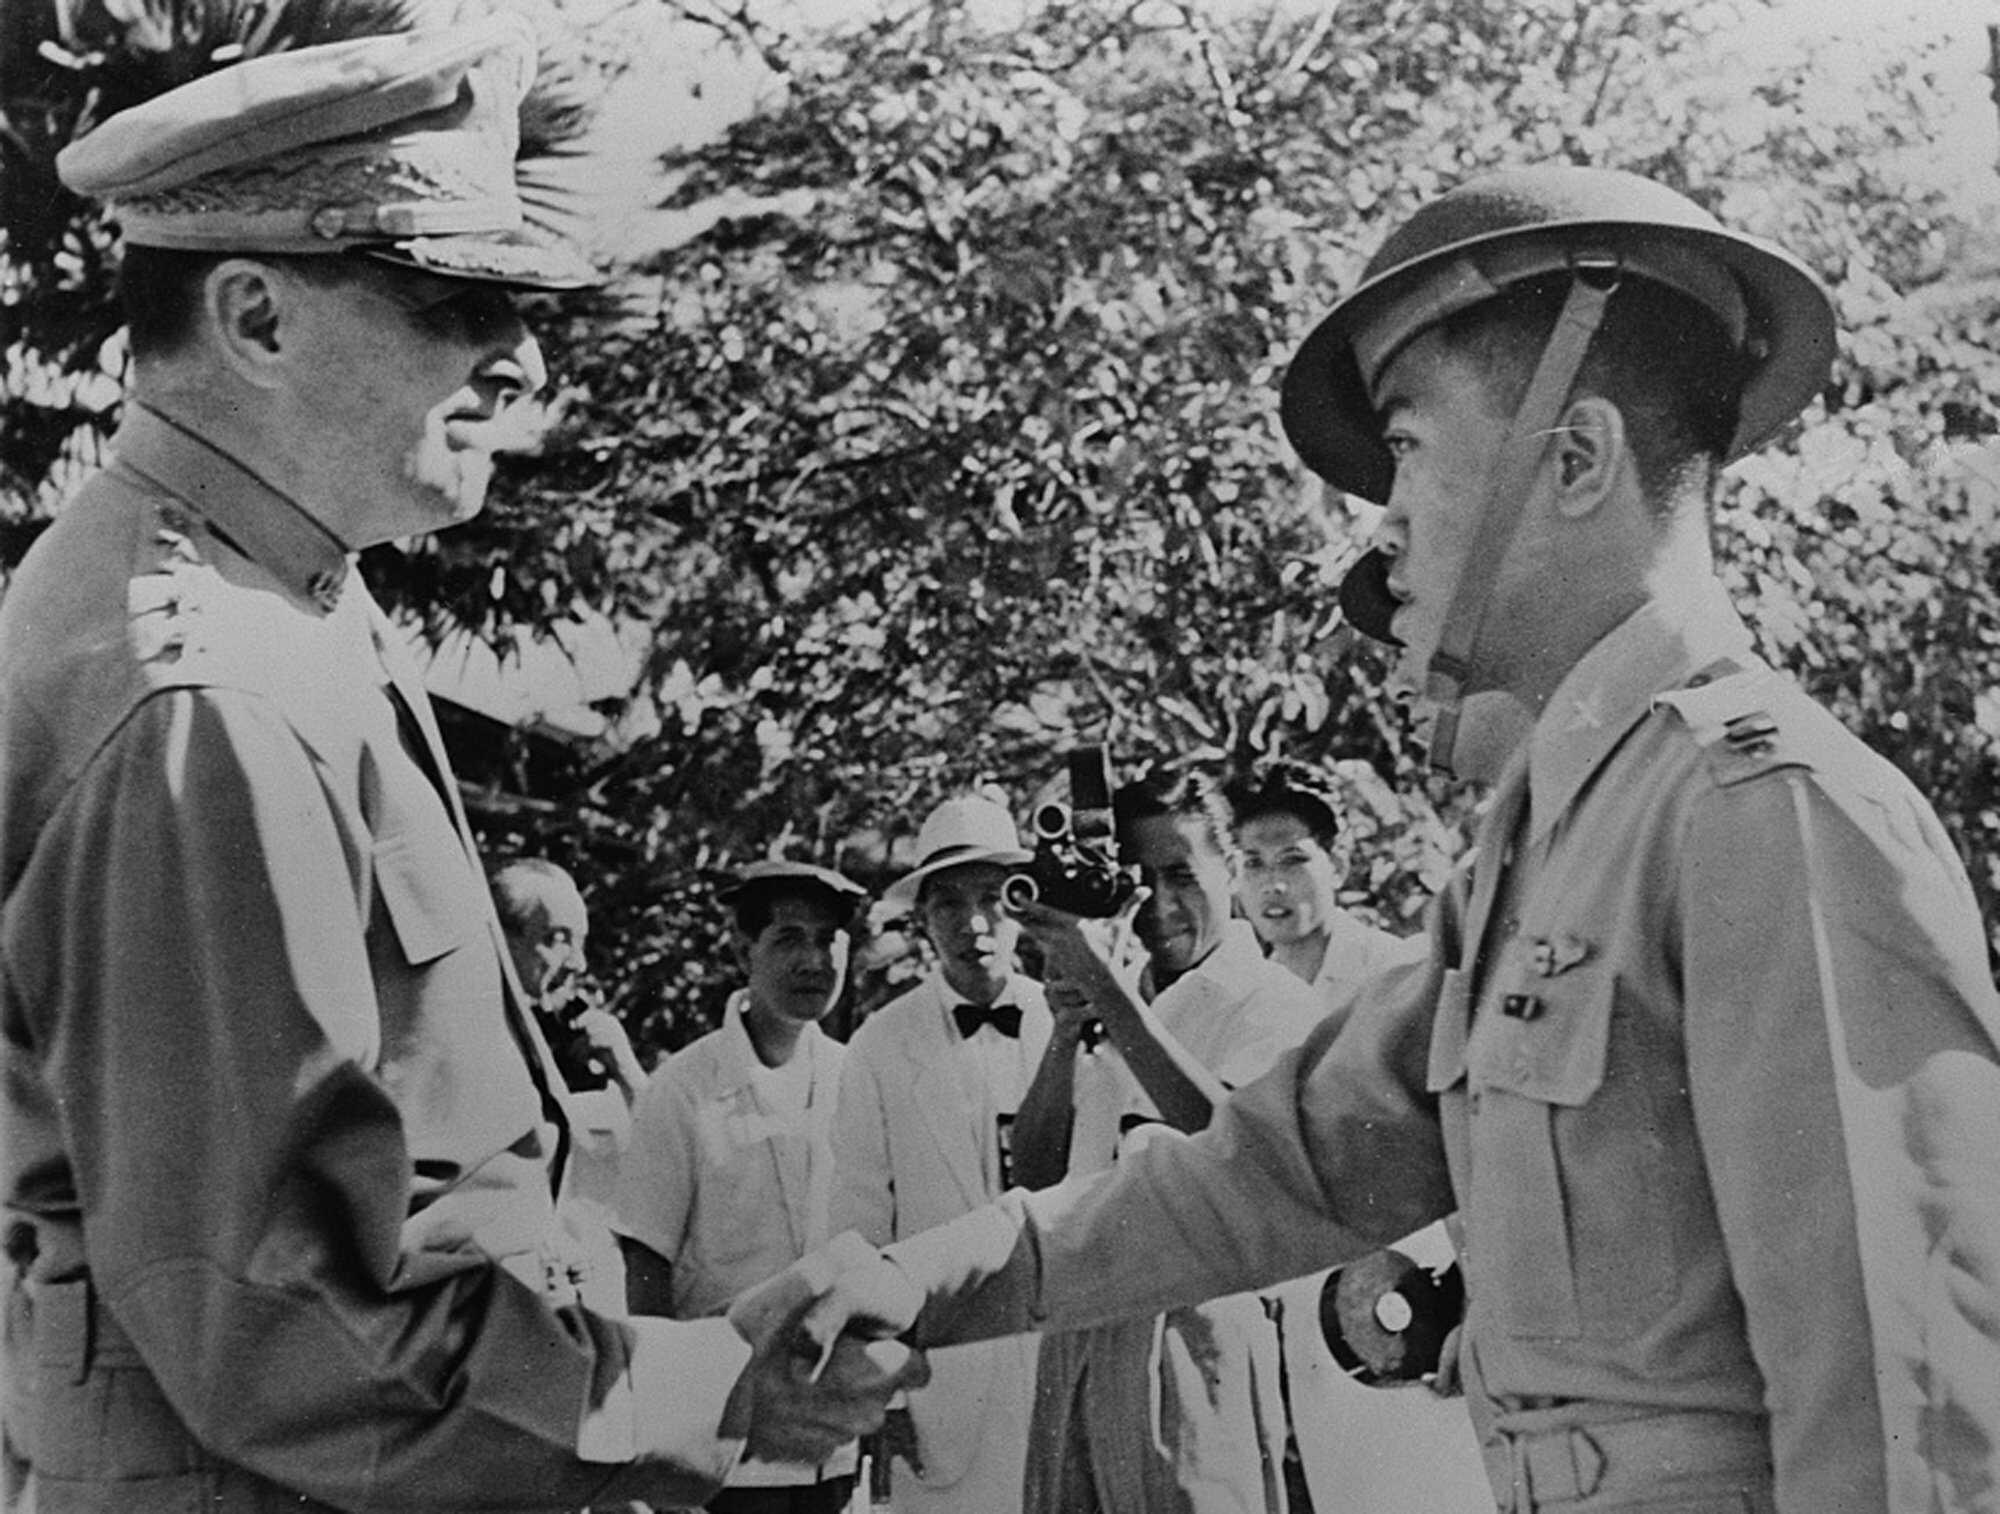 macarthur-Philipino-Veterans-December-22,-1941-LOC.jpg